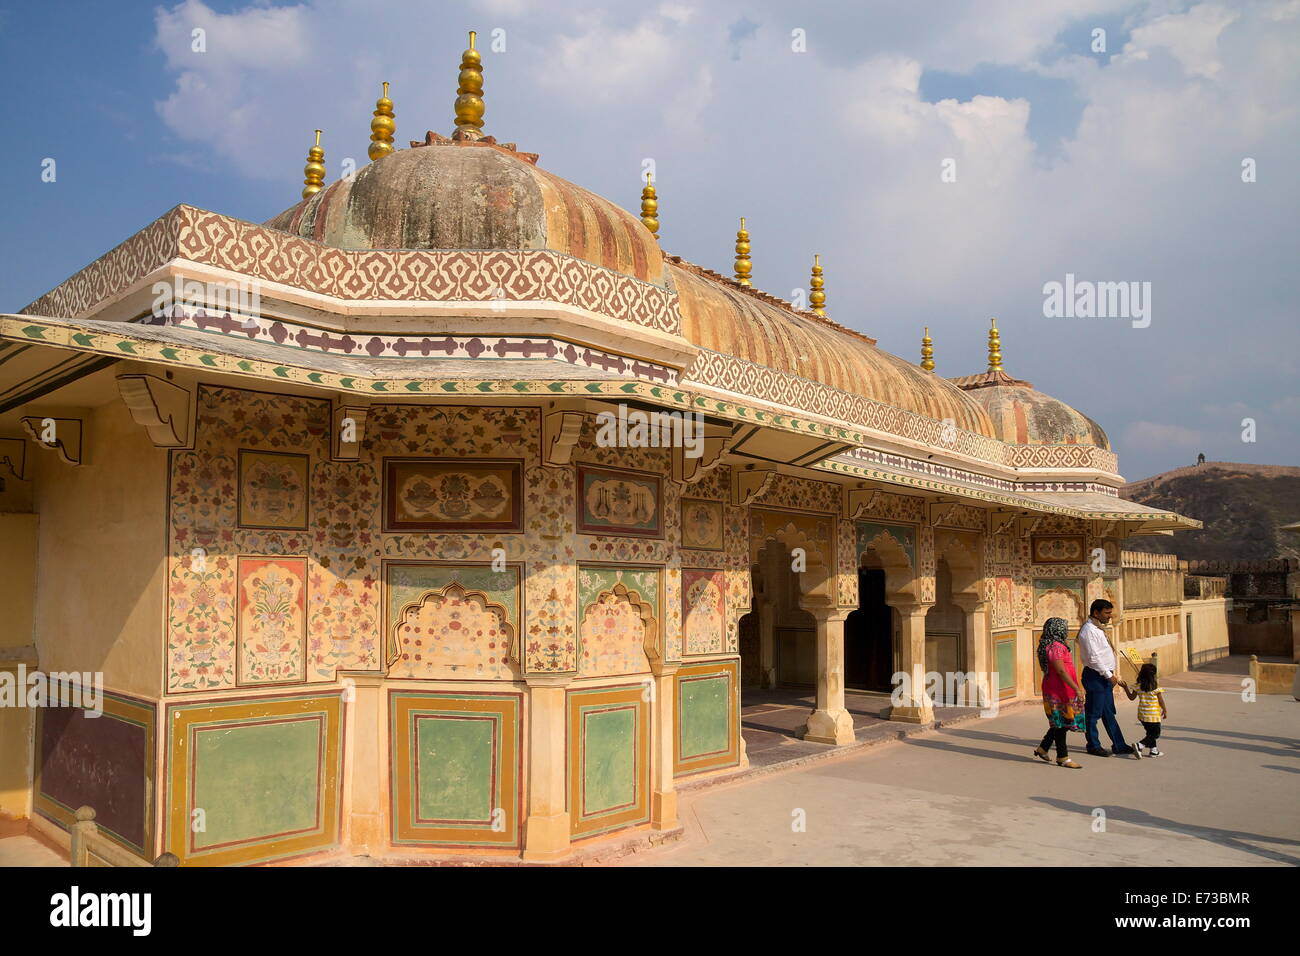 Au-dessus du pavillon, porte Ganesh Bol Fort Amber Palace, Jaipur, Rajasthan, Inde, Asie Photo Stock